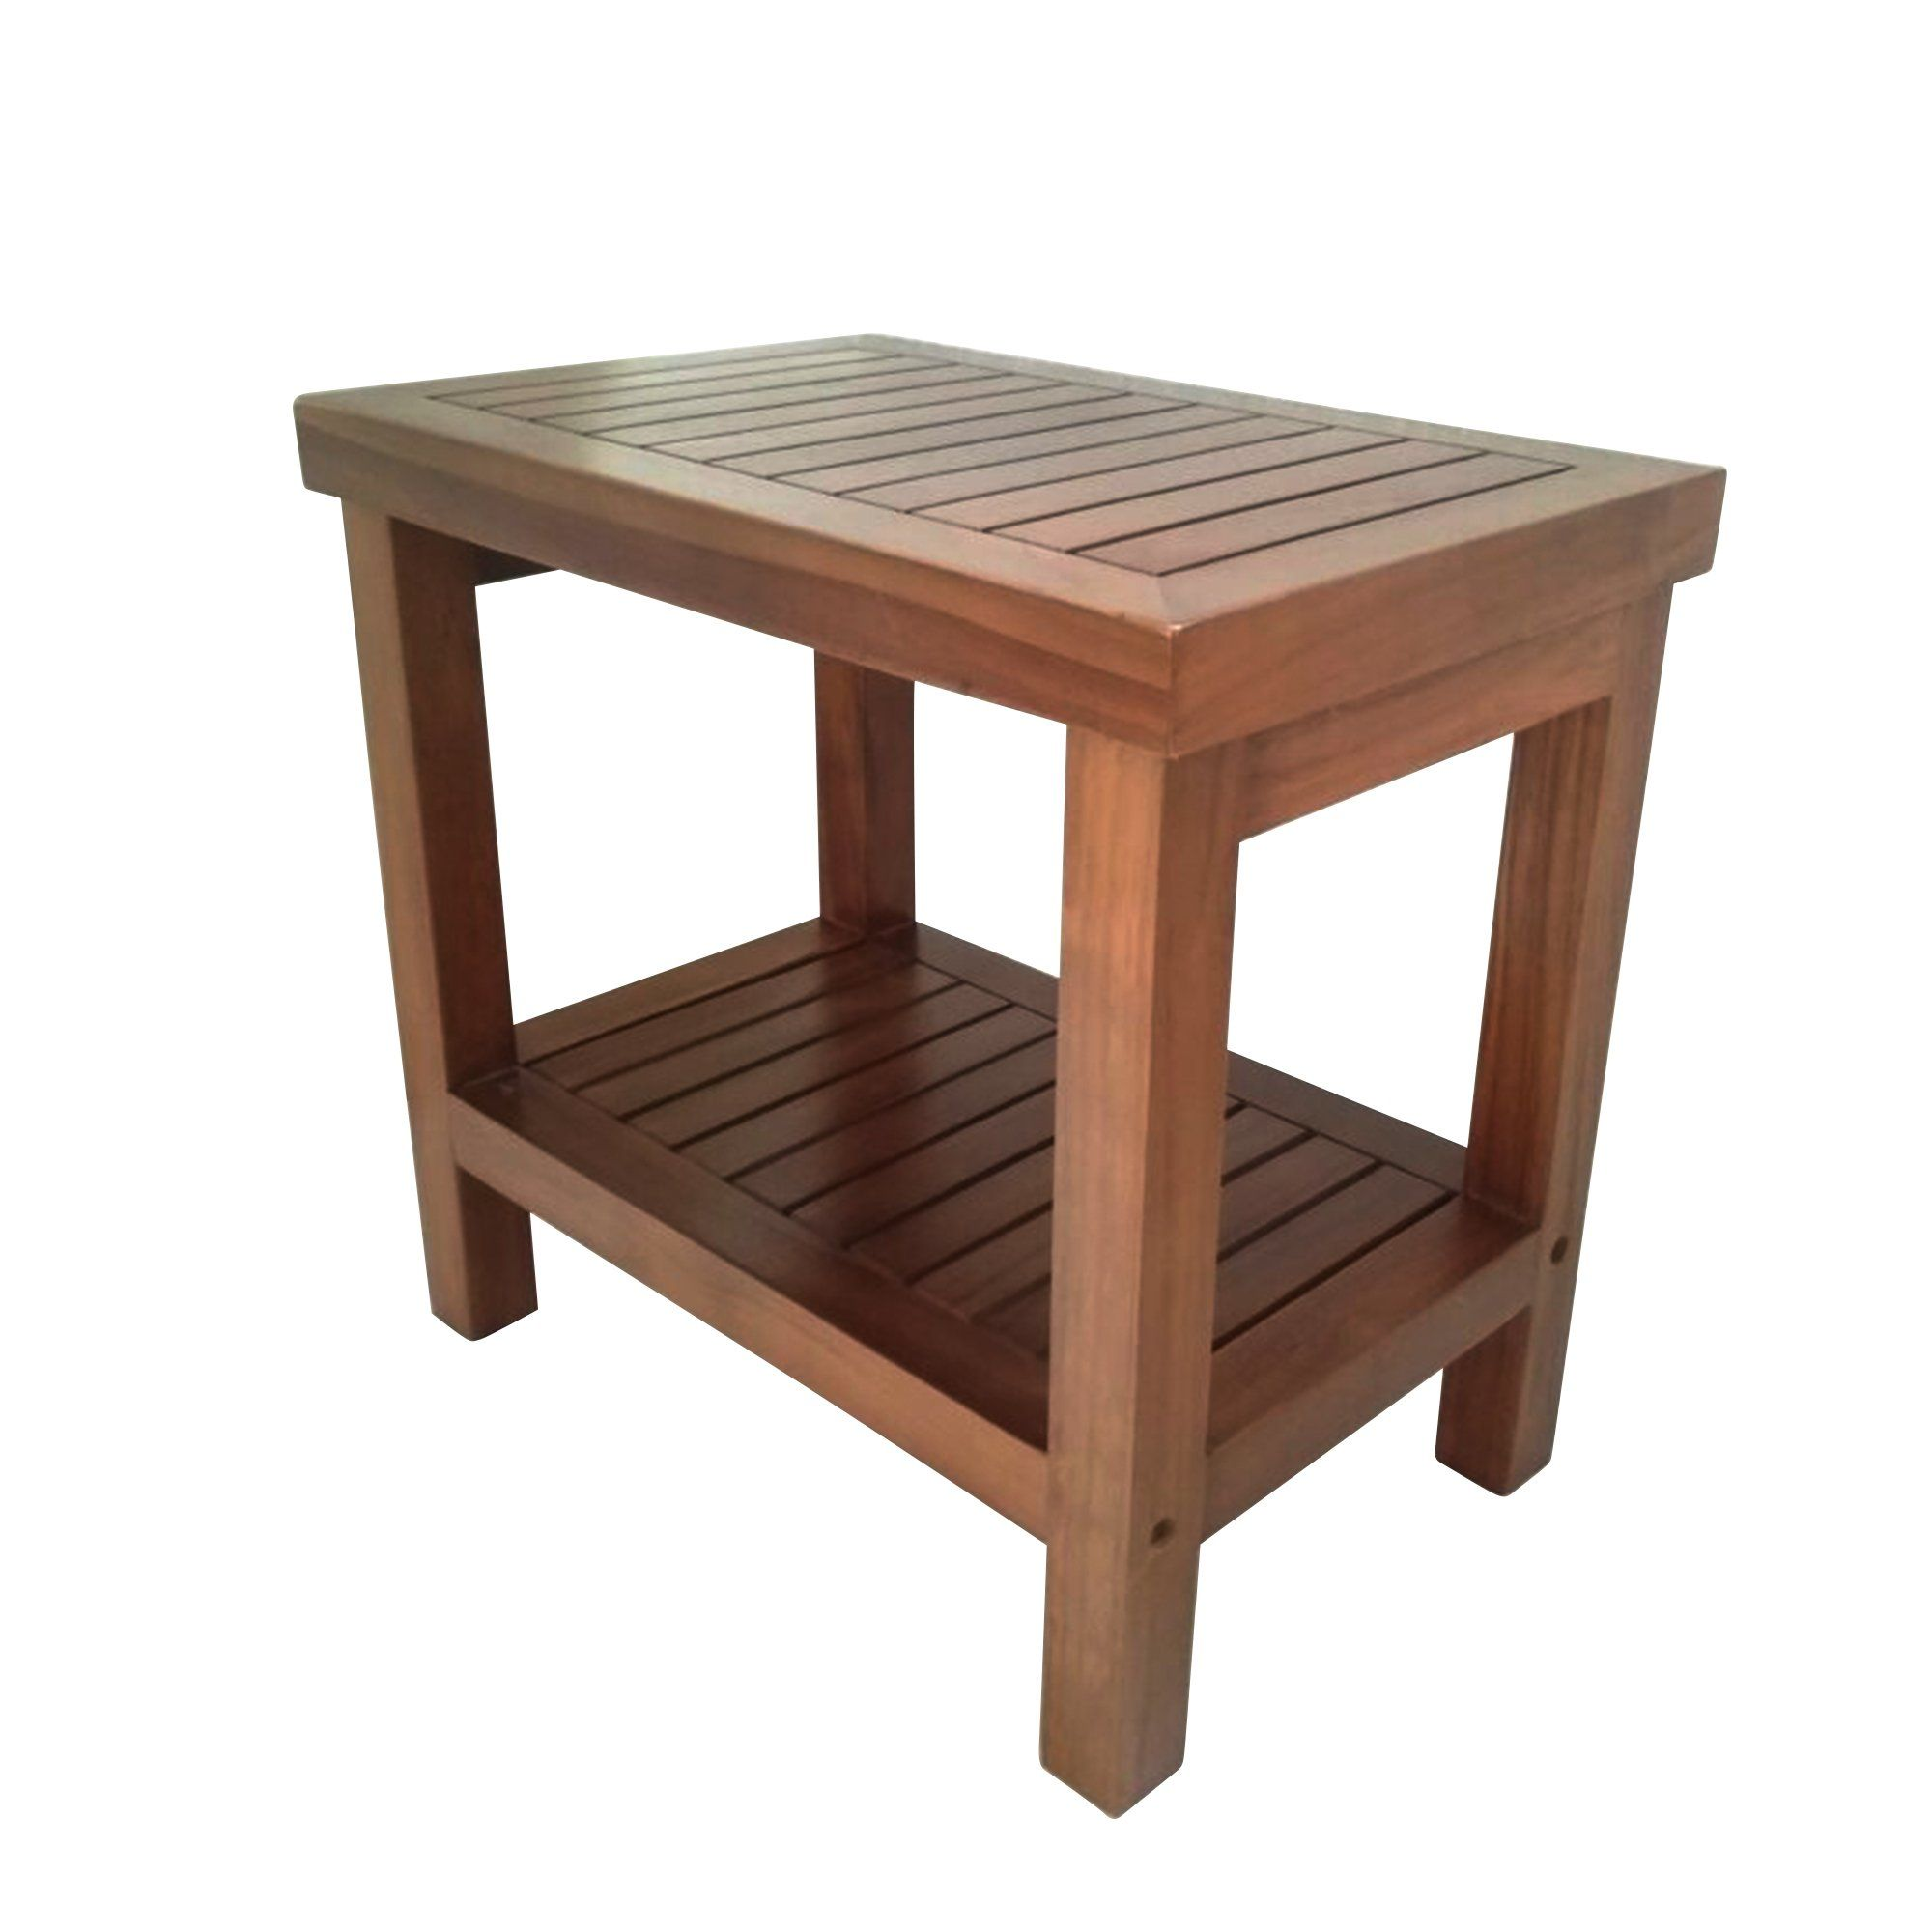 Wood Shower Bath Spa Waterproof Stool Bench With Shelf Brown Shower Seat Wood Shower Bench Teak Furniture